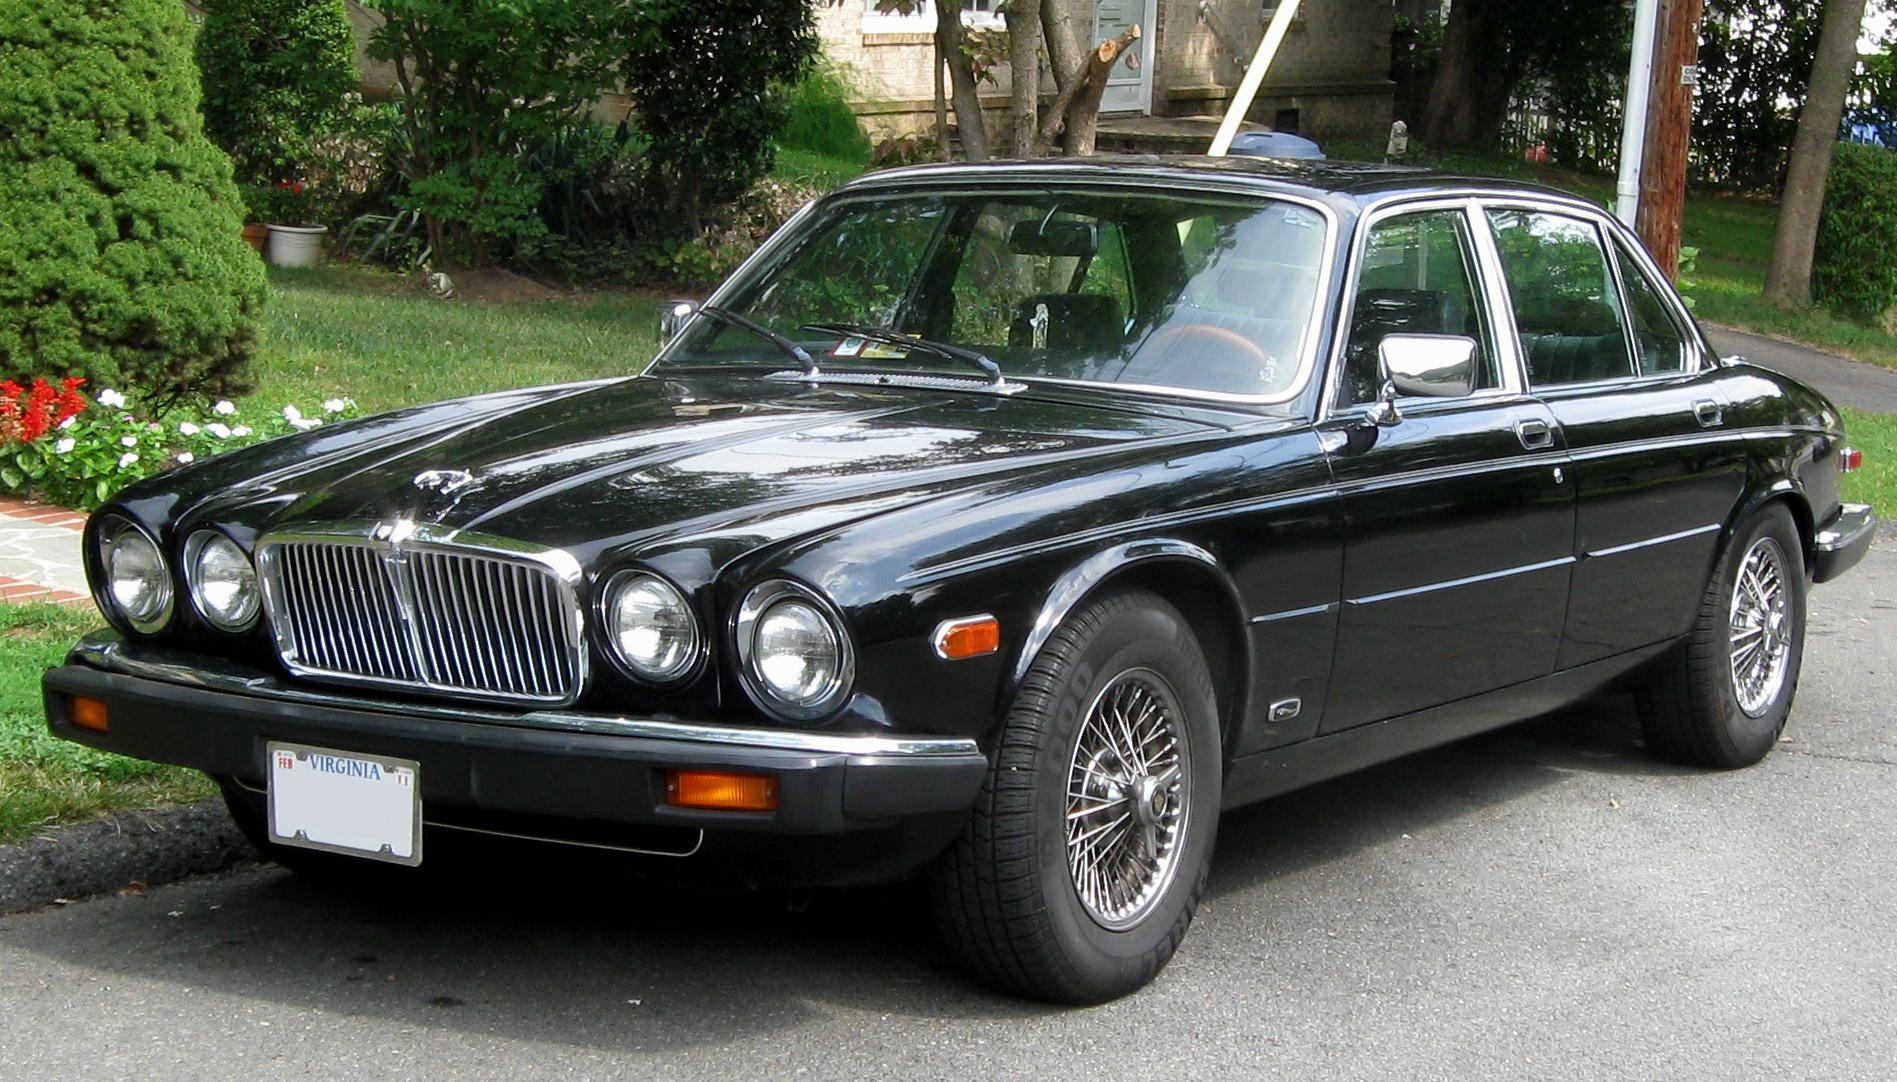 Jaguar XJ6 Wallpaper Download